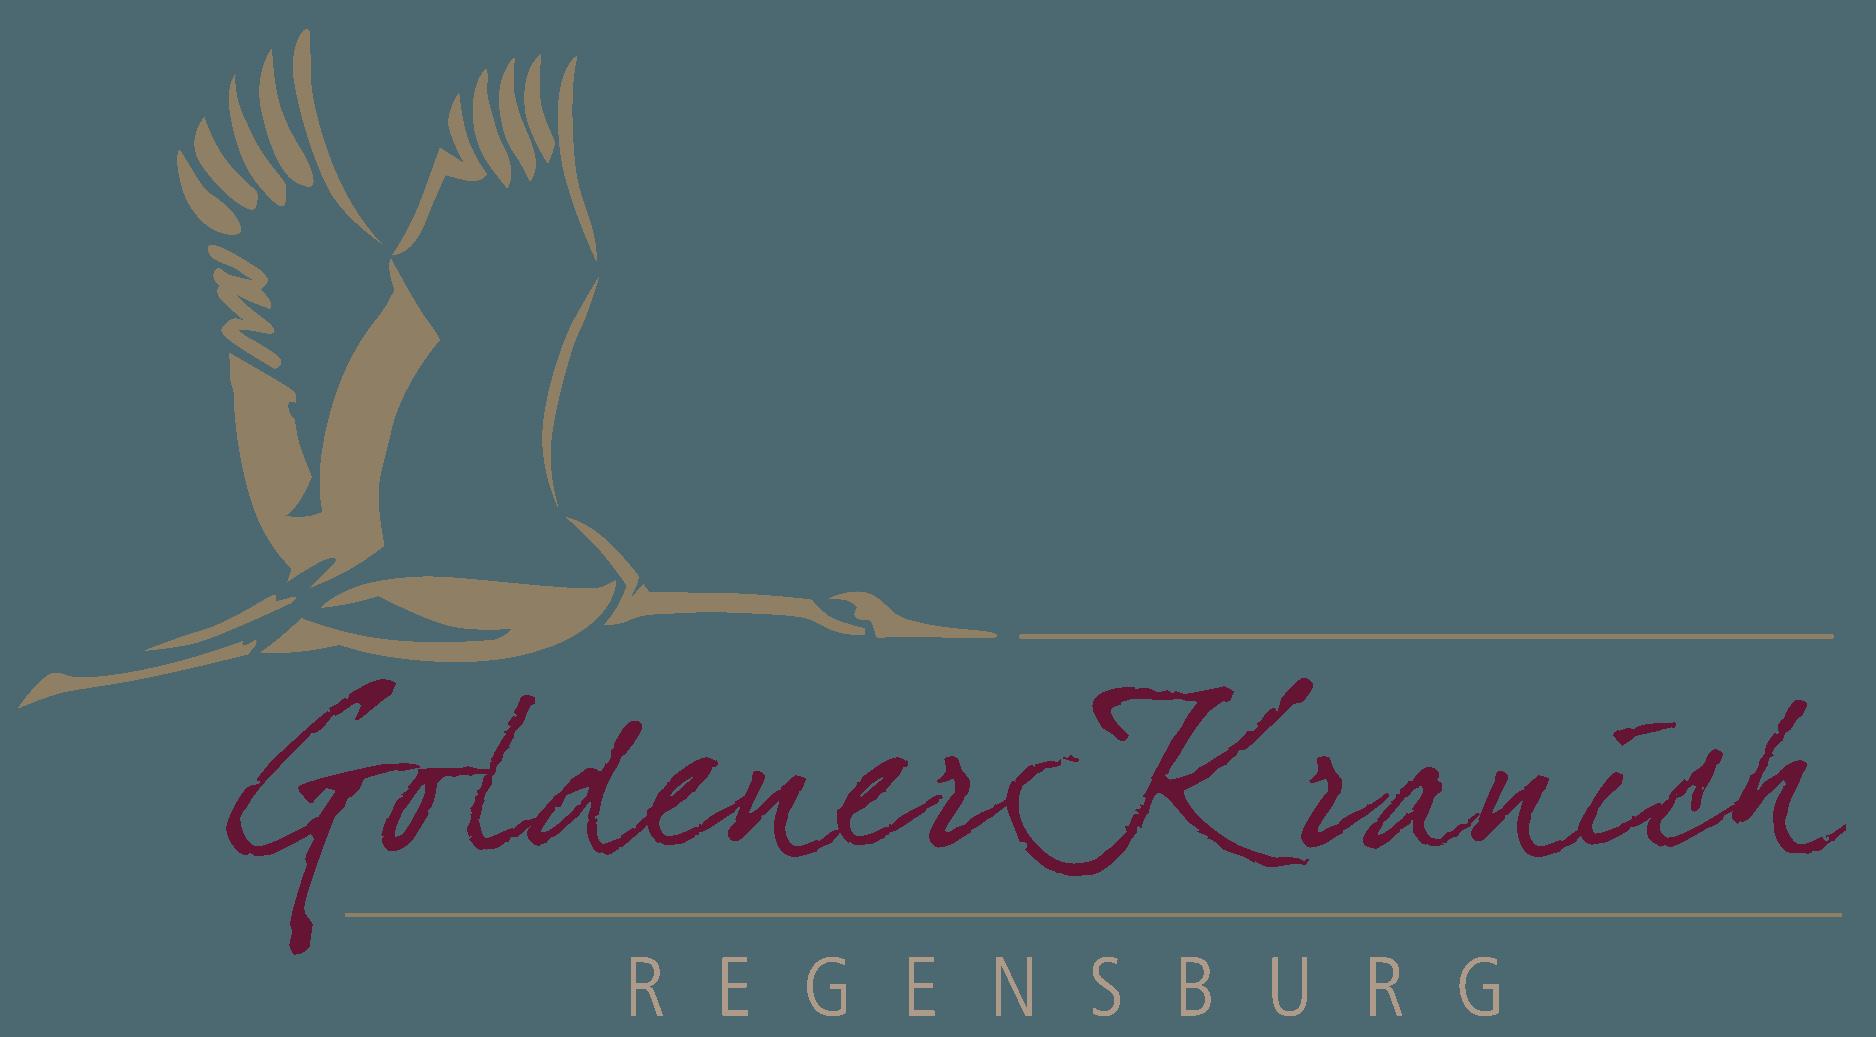 Apartment Goldener Kranich, Logo